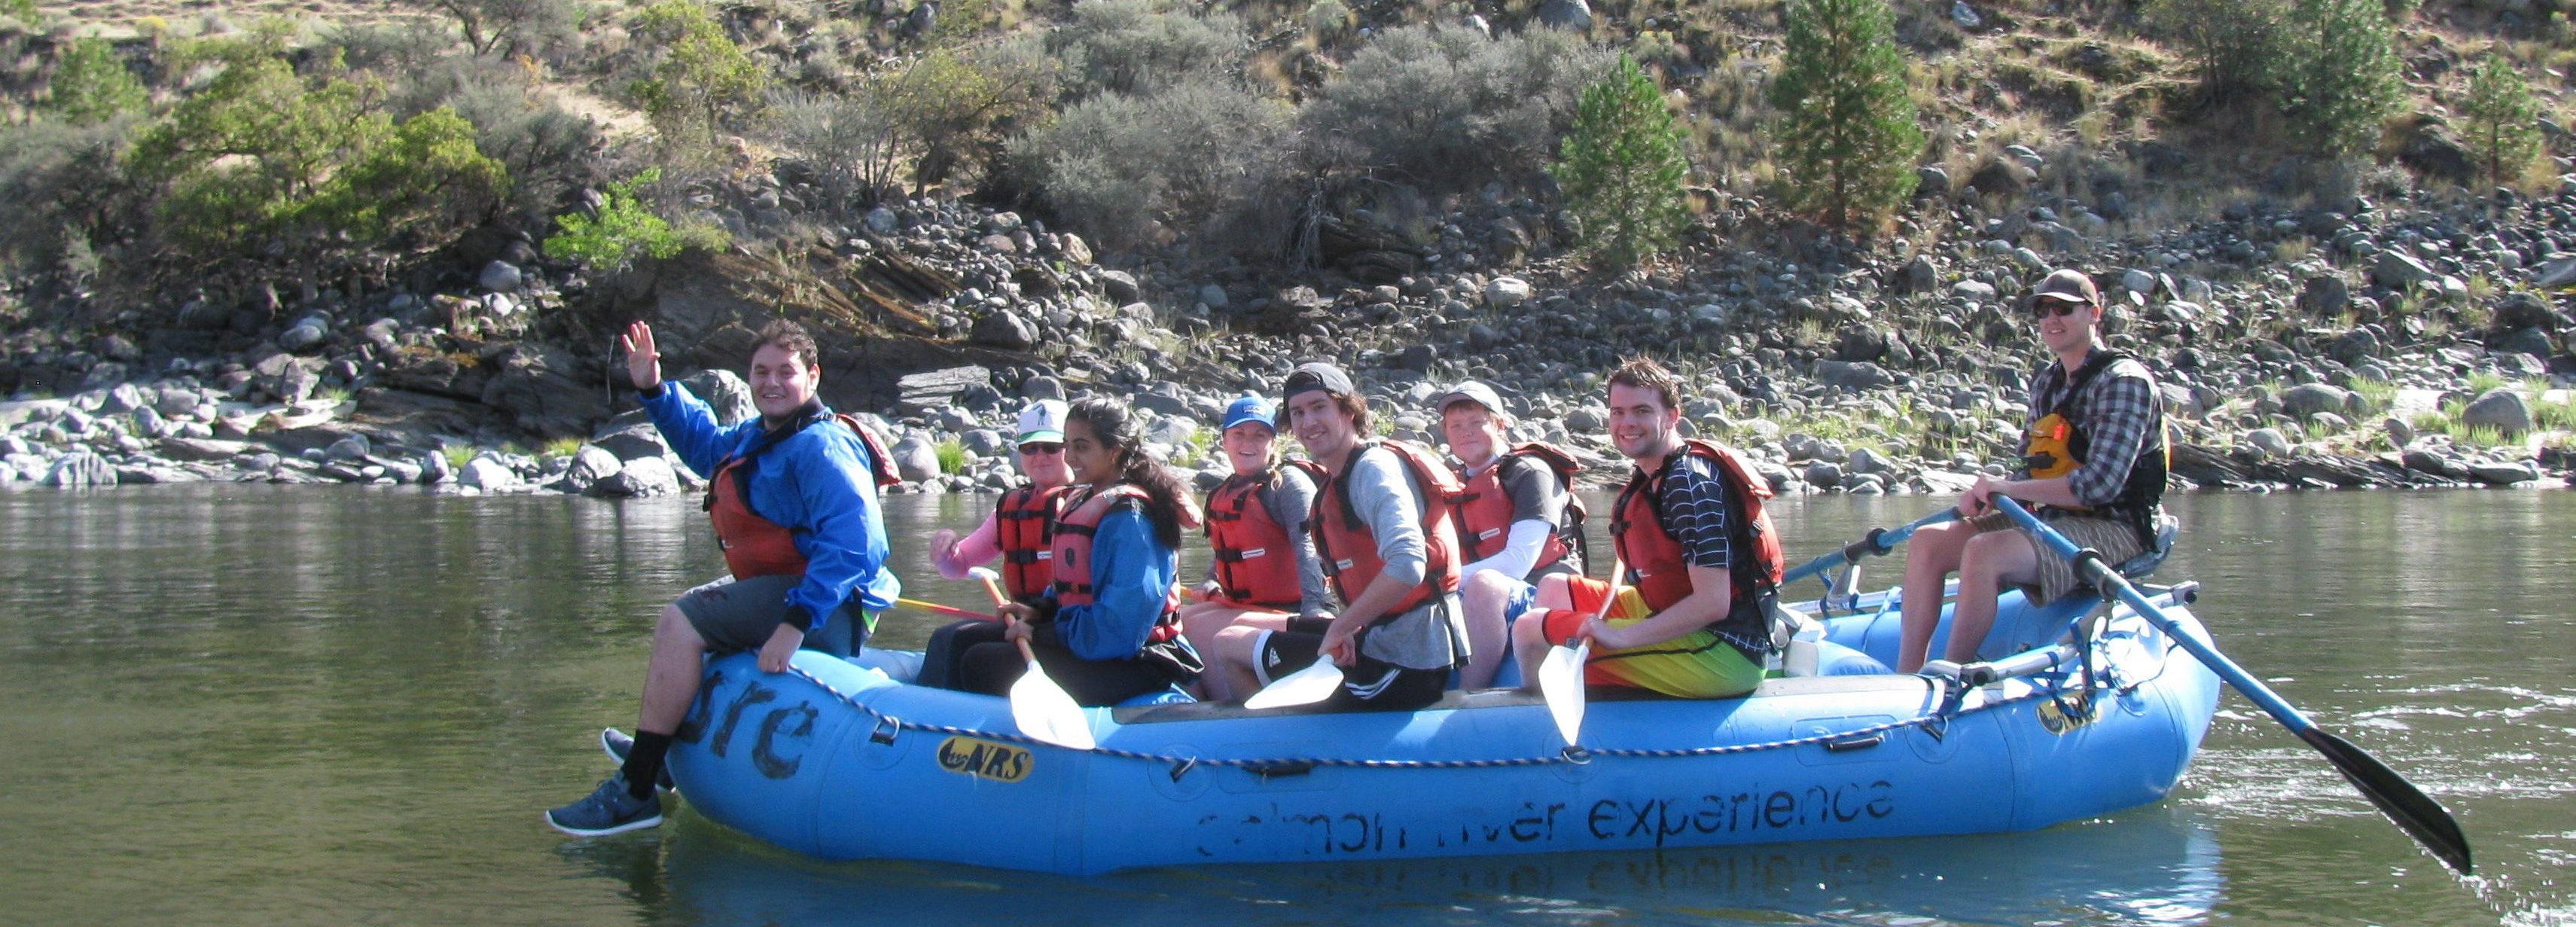 students on raft trip